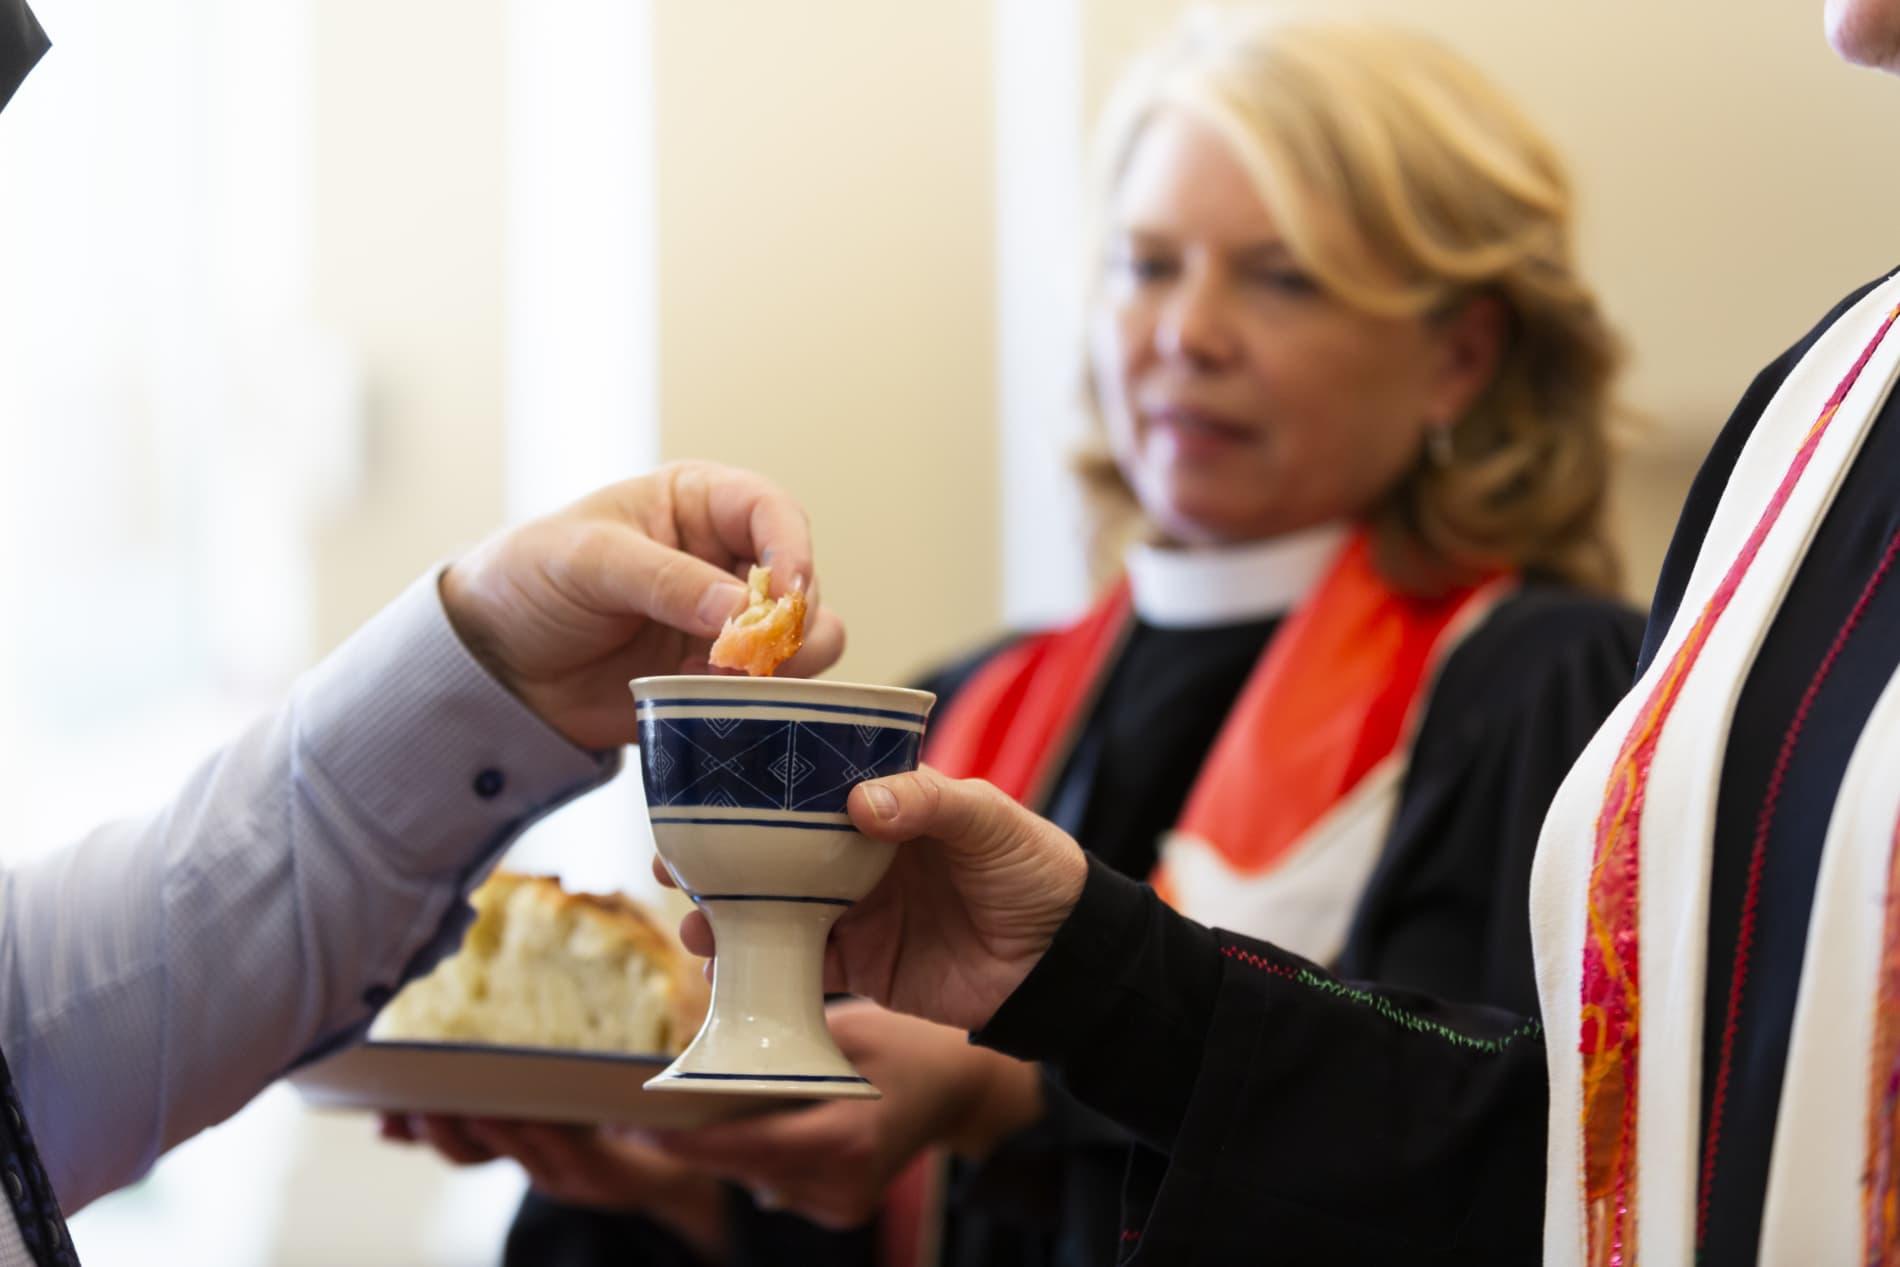 Pastor sharing communion